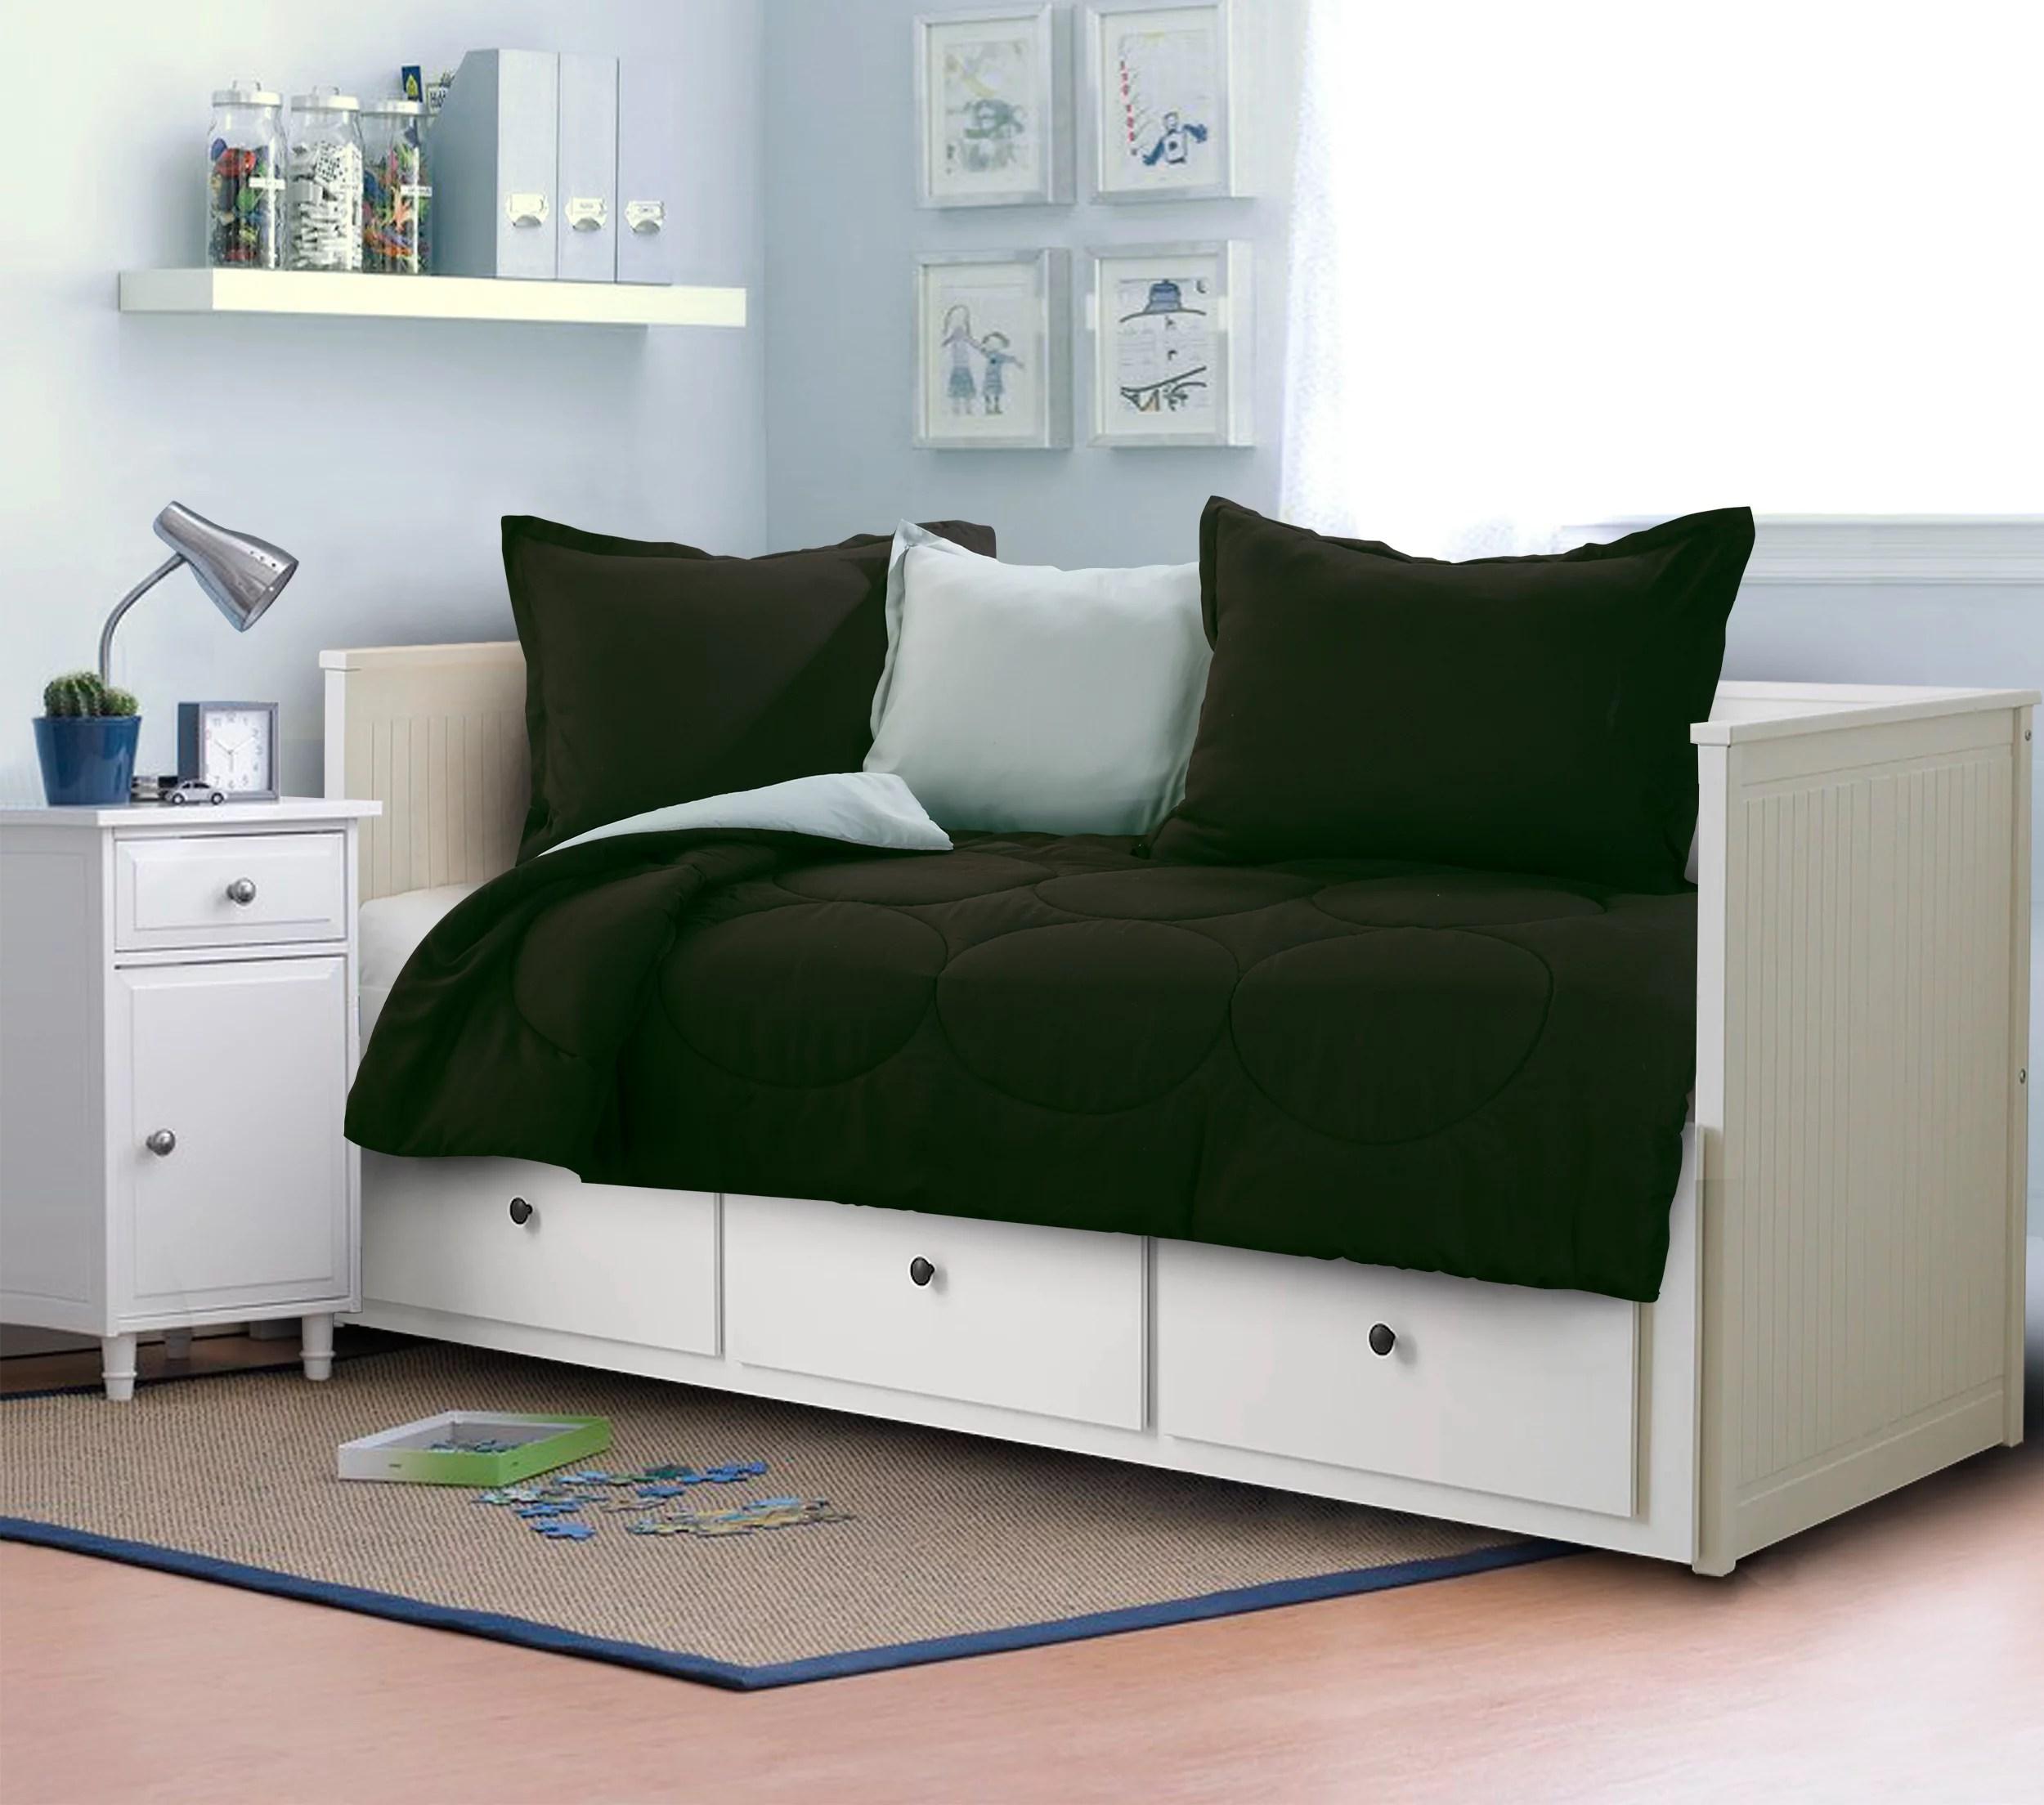 mainstays kids solid reversible daybed comforter set black gray